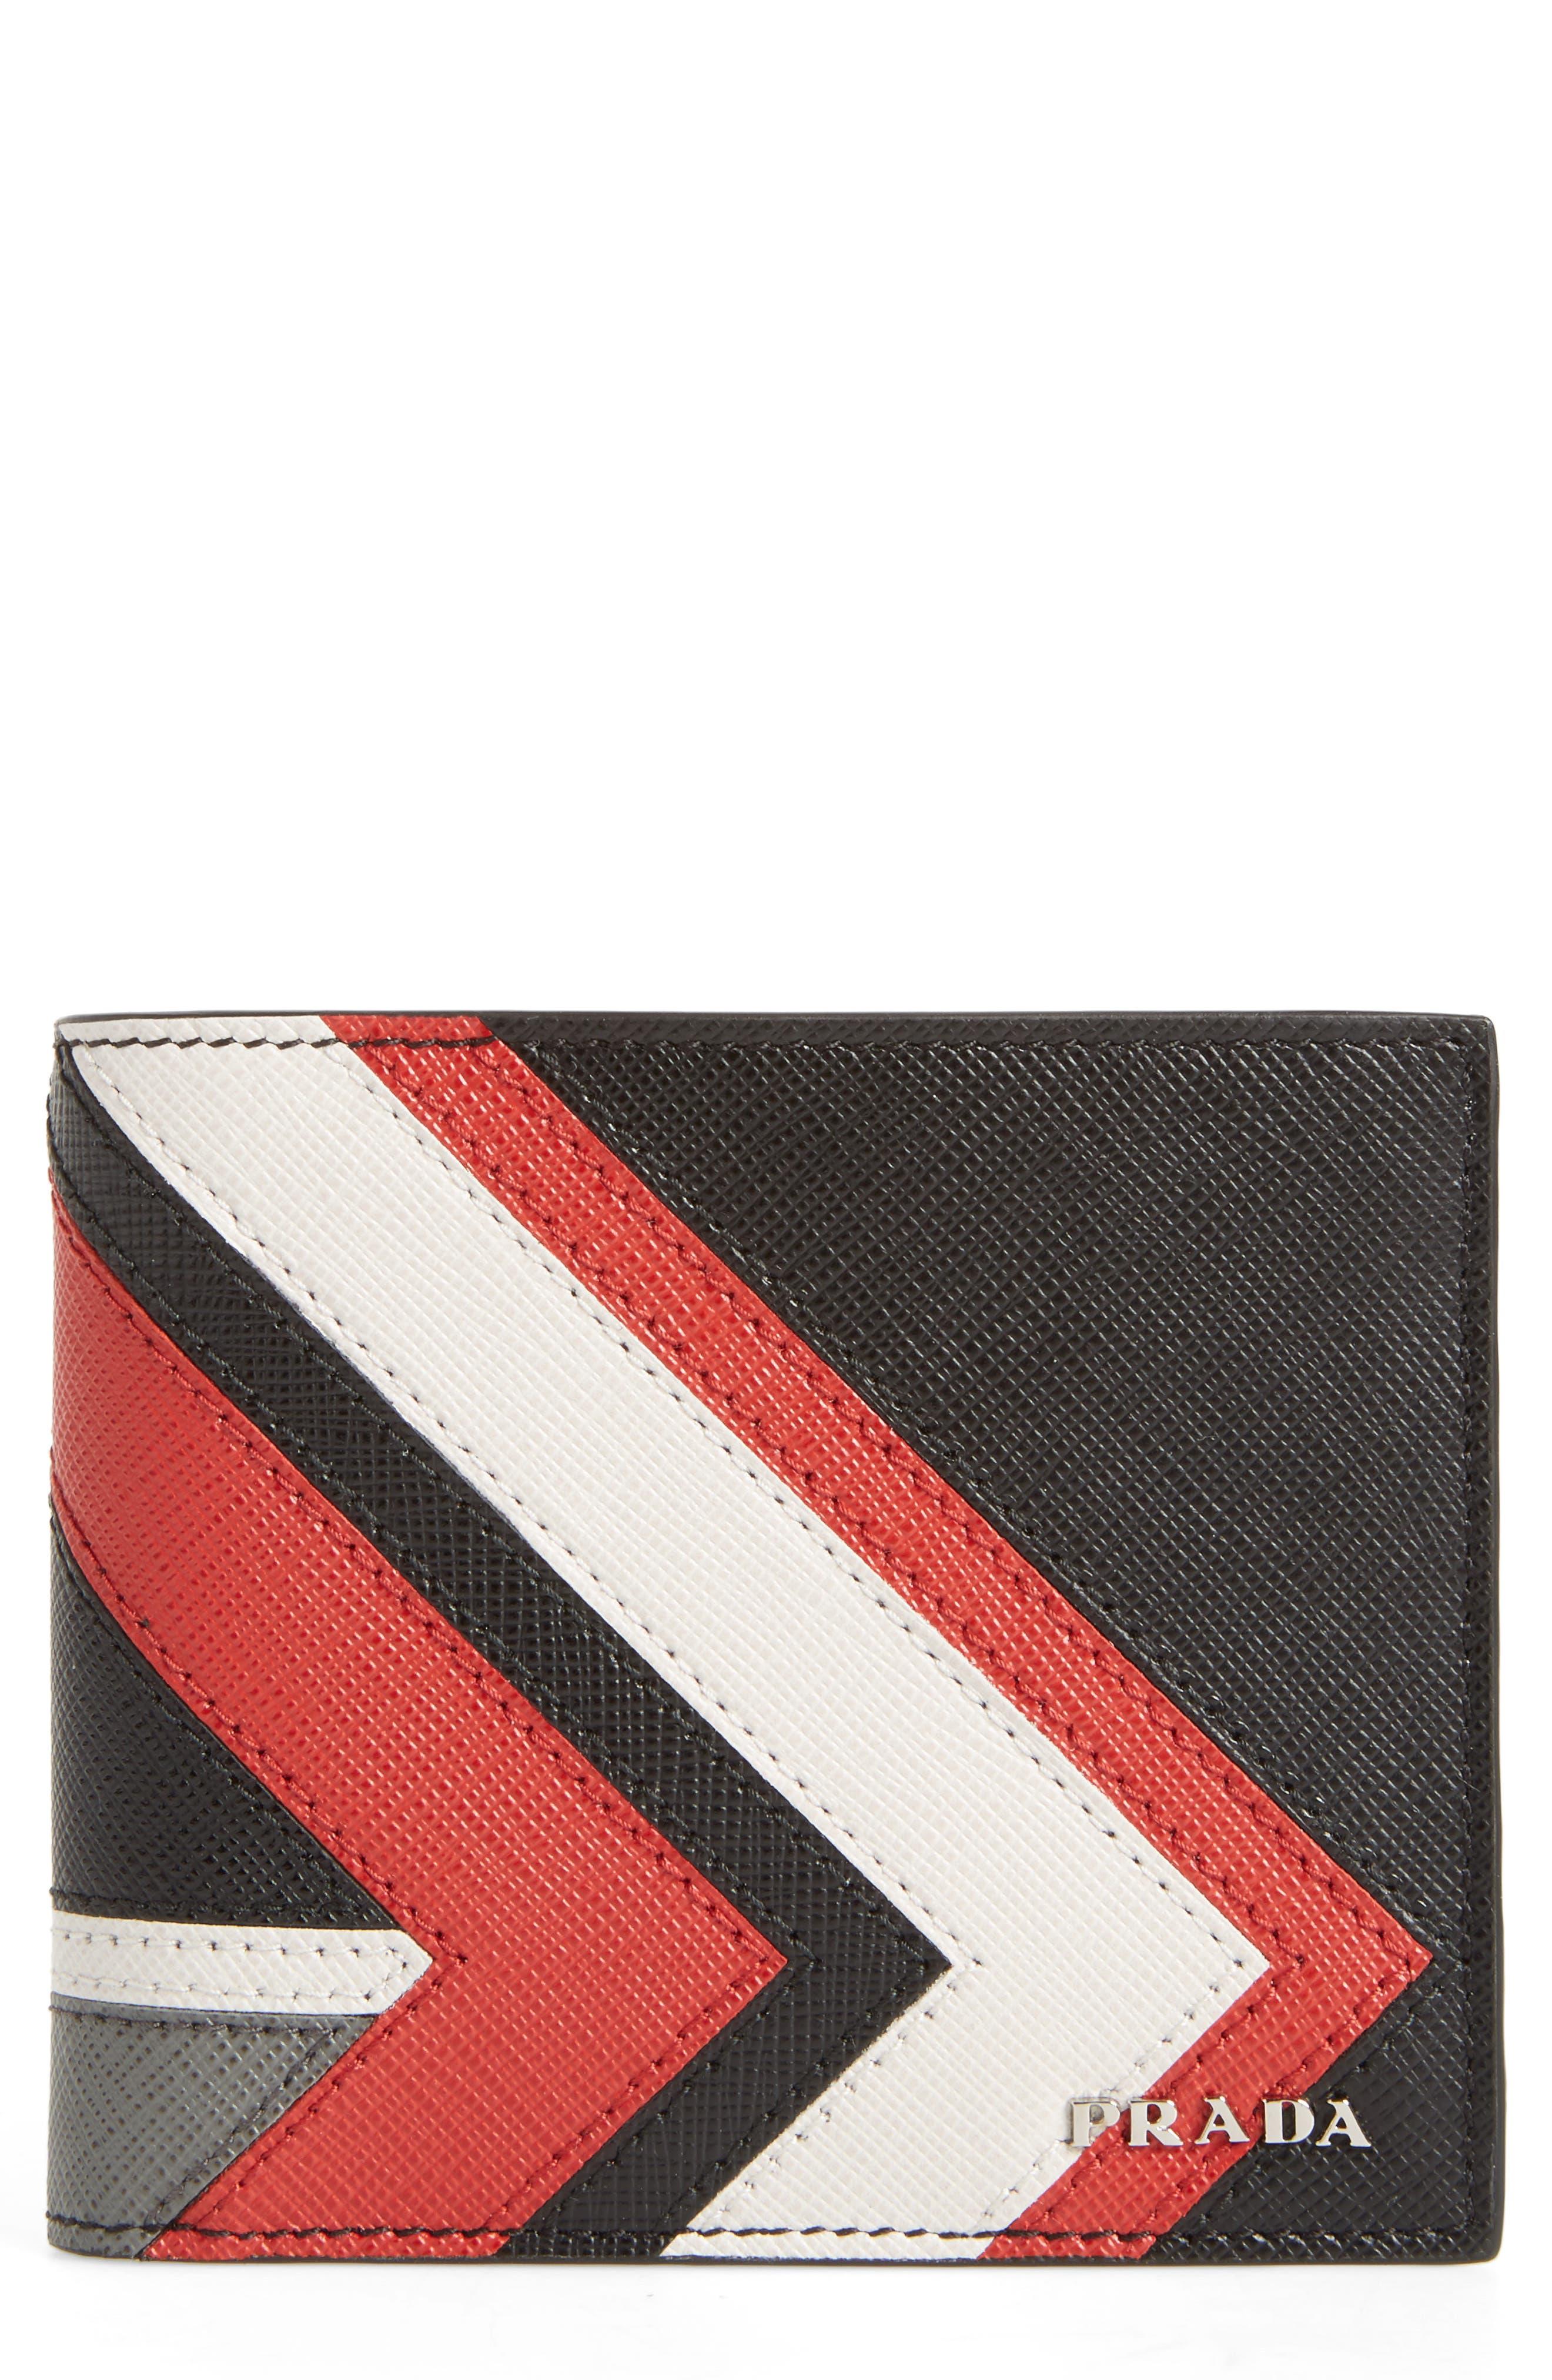 Prada Arrow Calfskin Leather Wallet